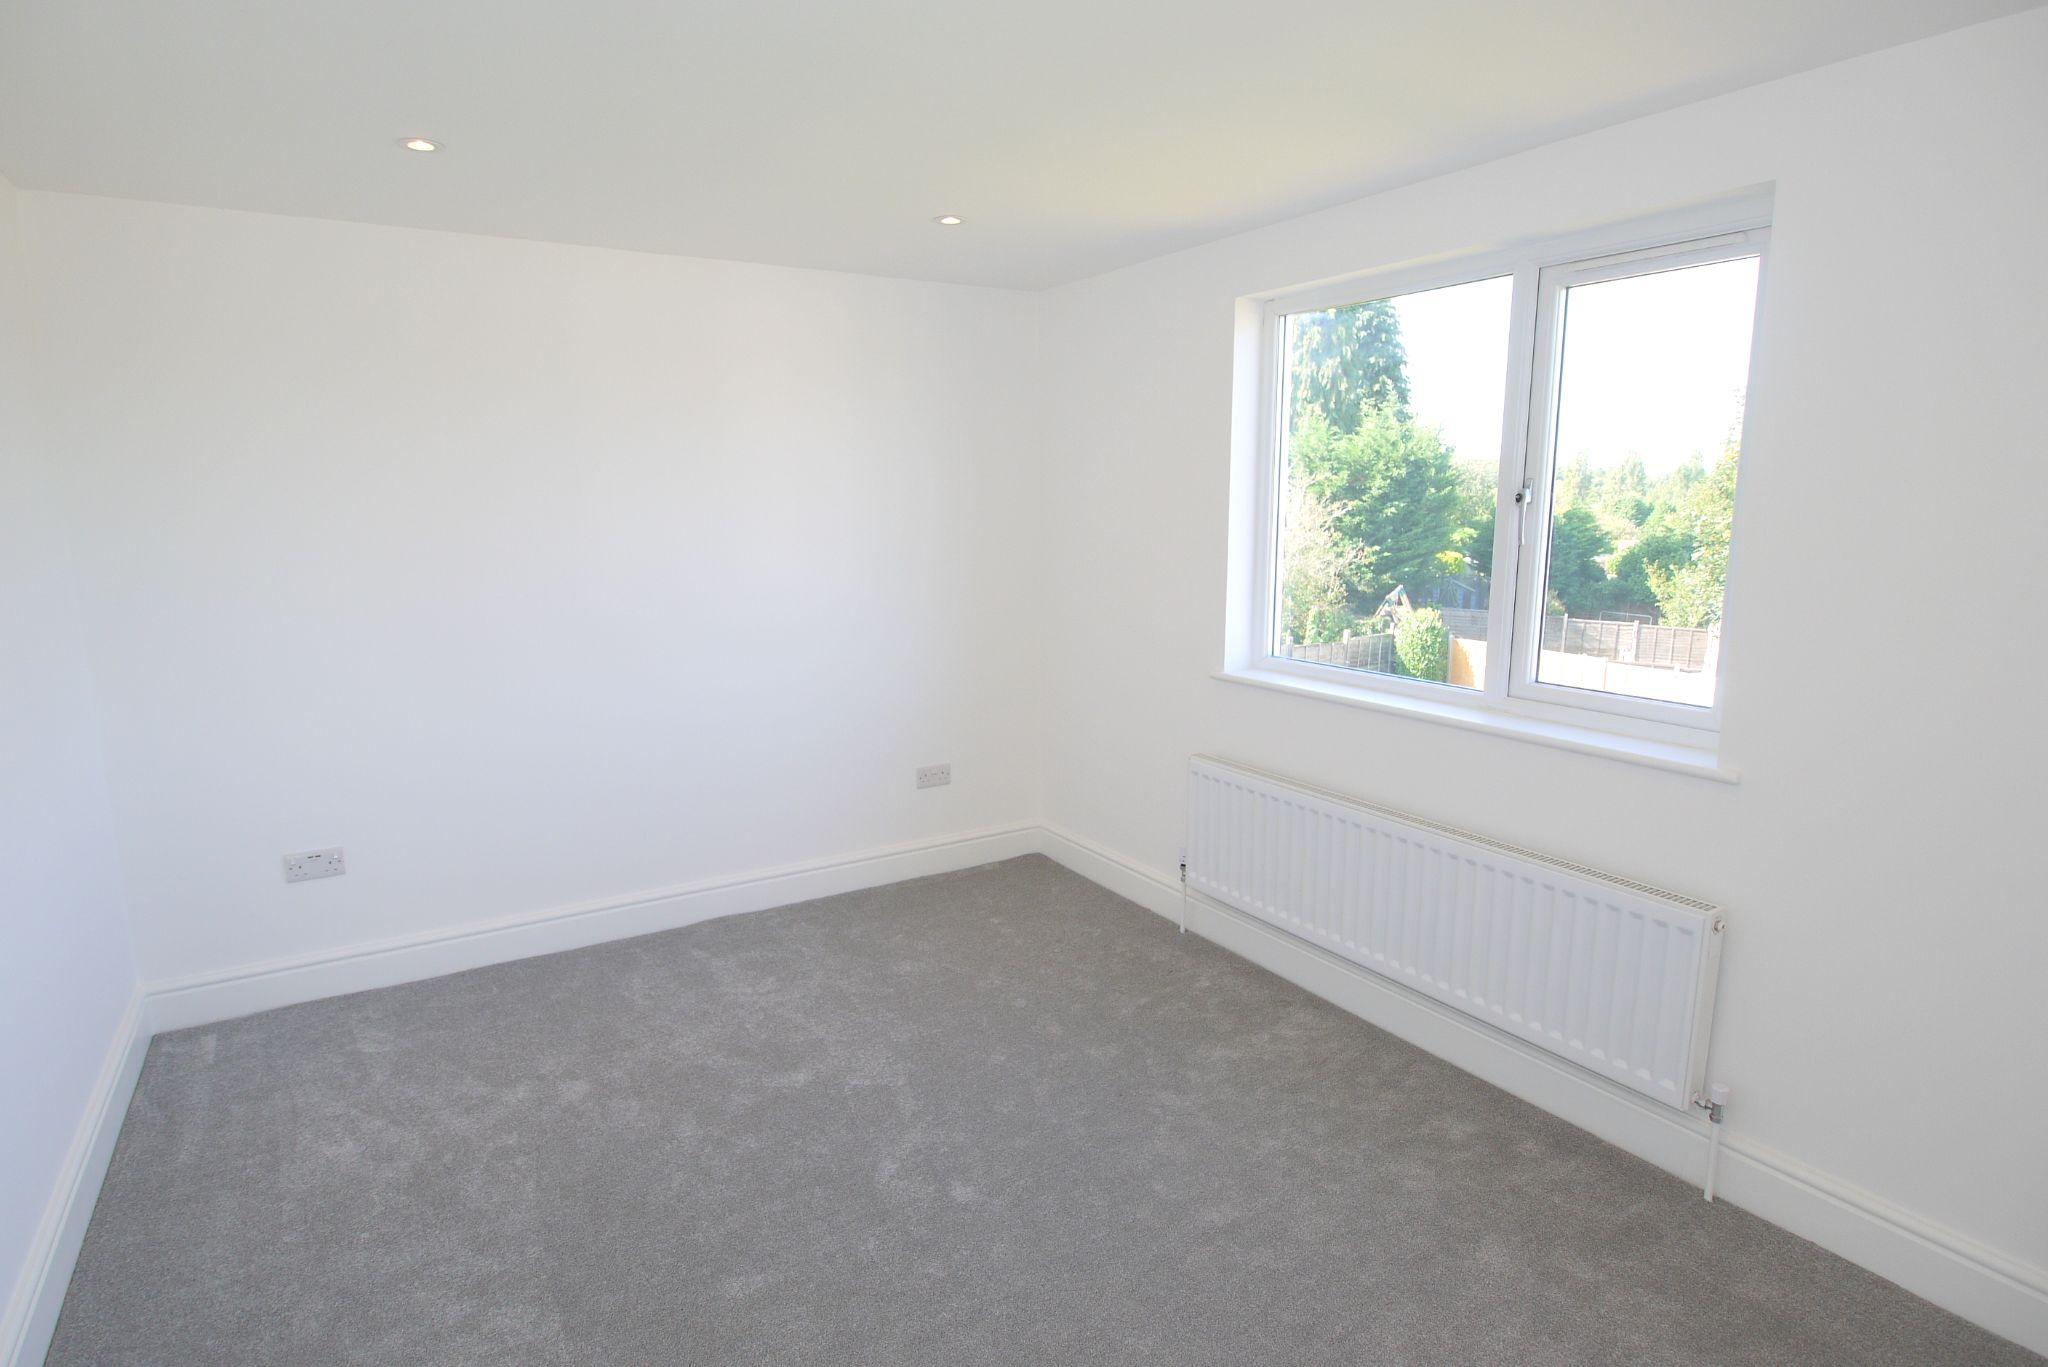 3 bedroom chalet house For Sale in Sevenoaks - Photograph 5